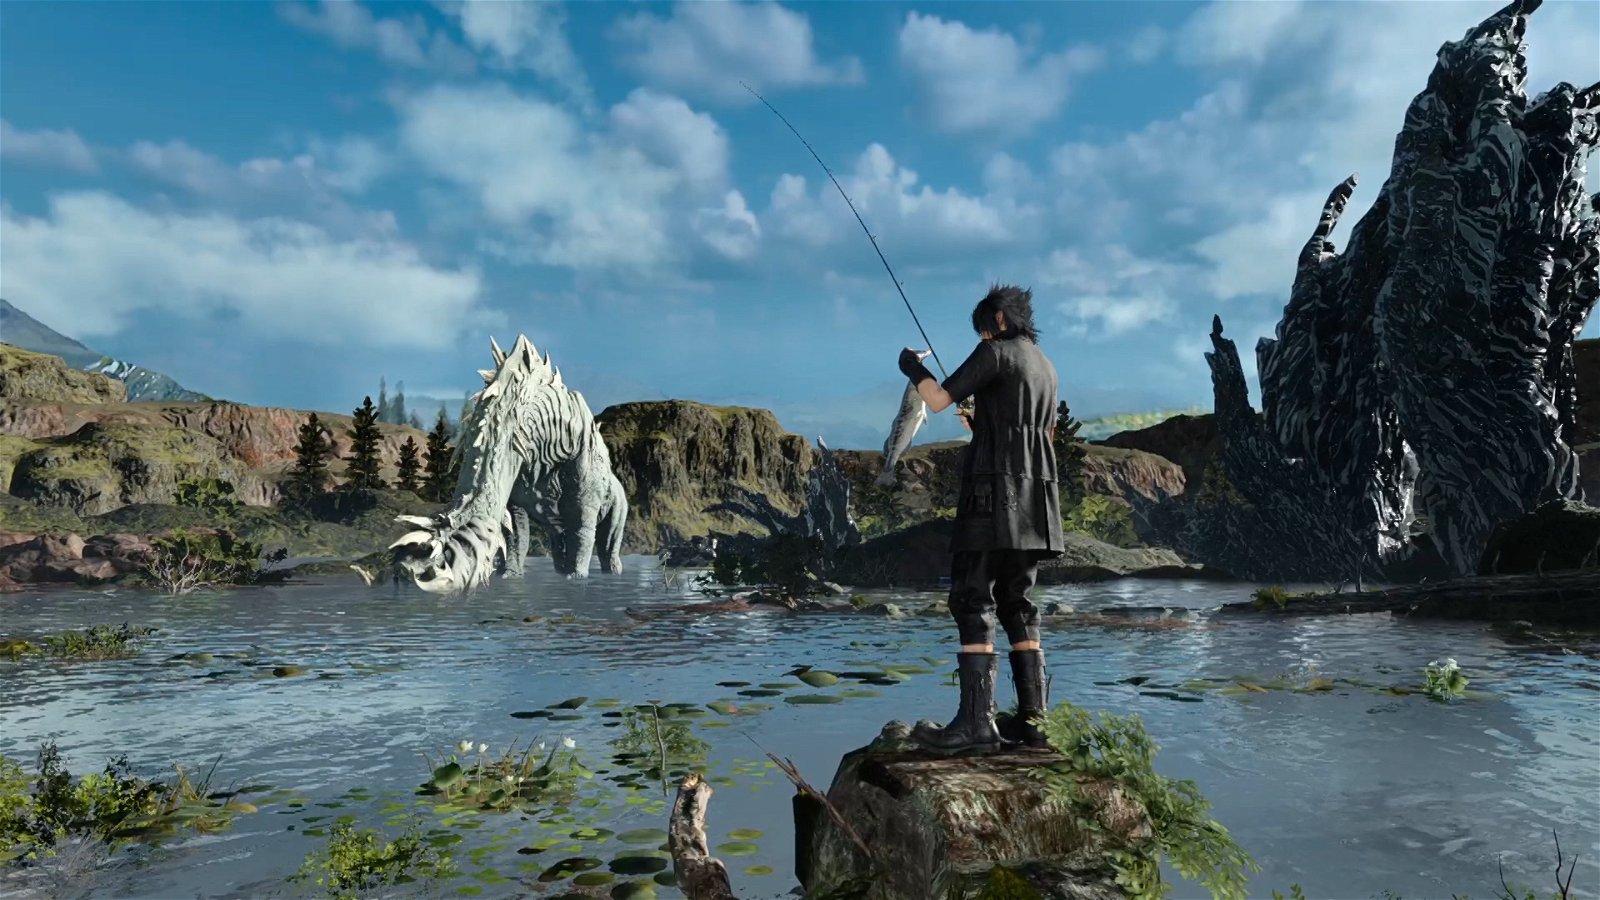 Monster of the Deep: Final Fantasy XV (PSVR) Review: Not-So-Deep Fishing Sim 1